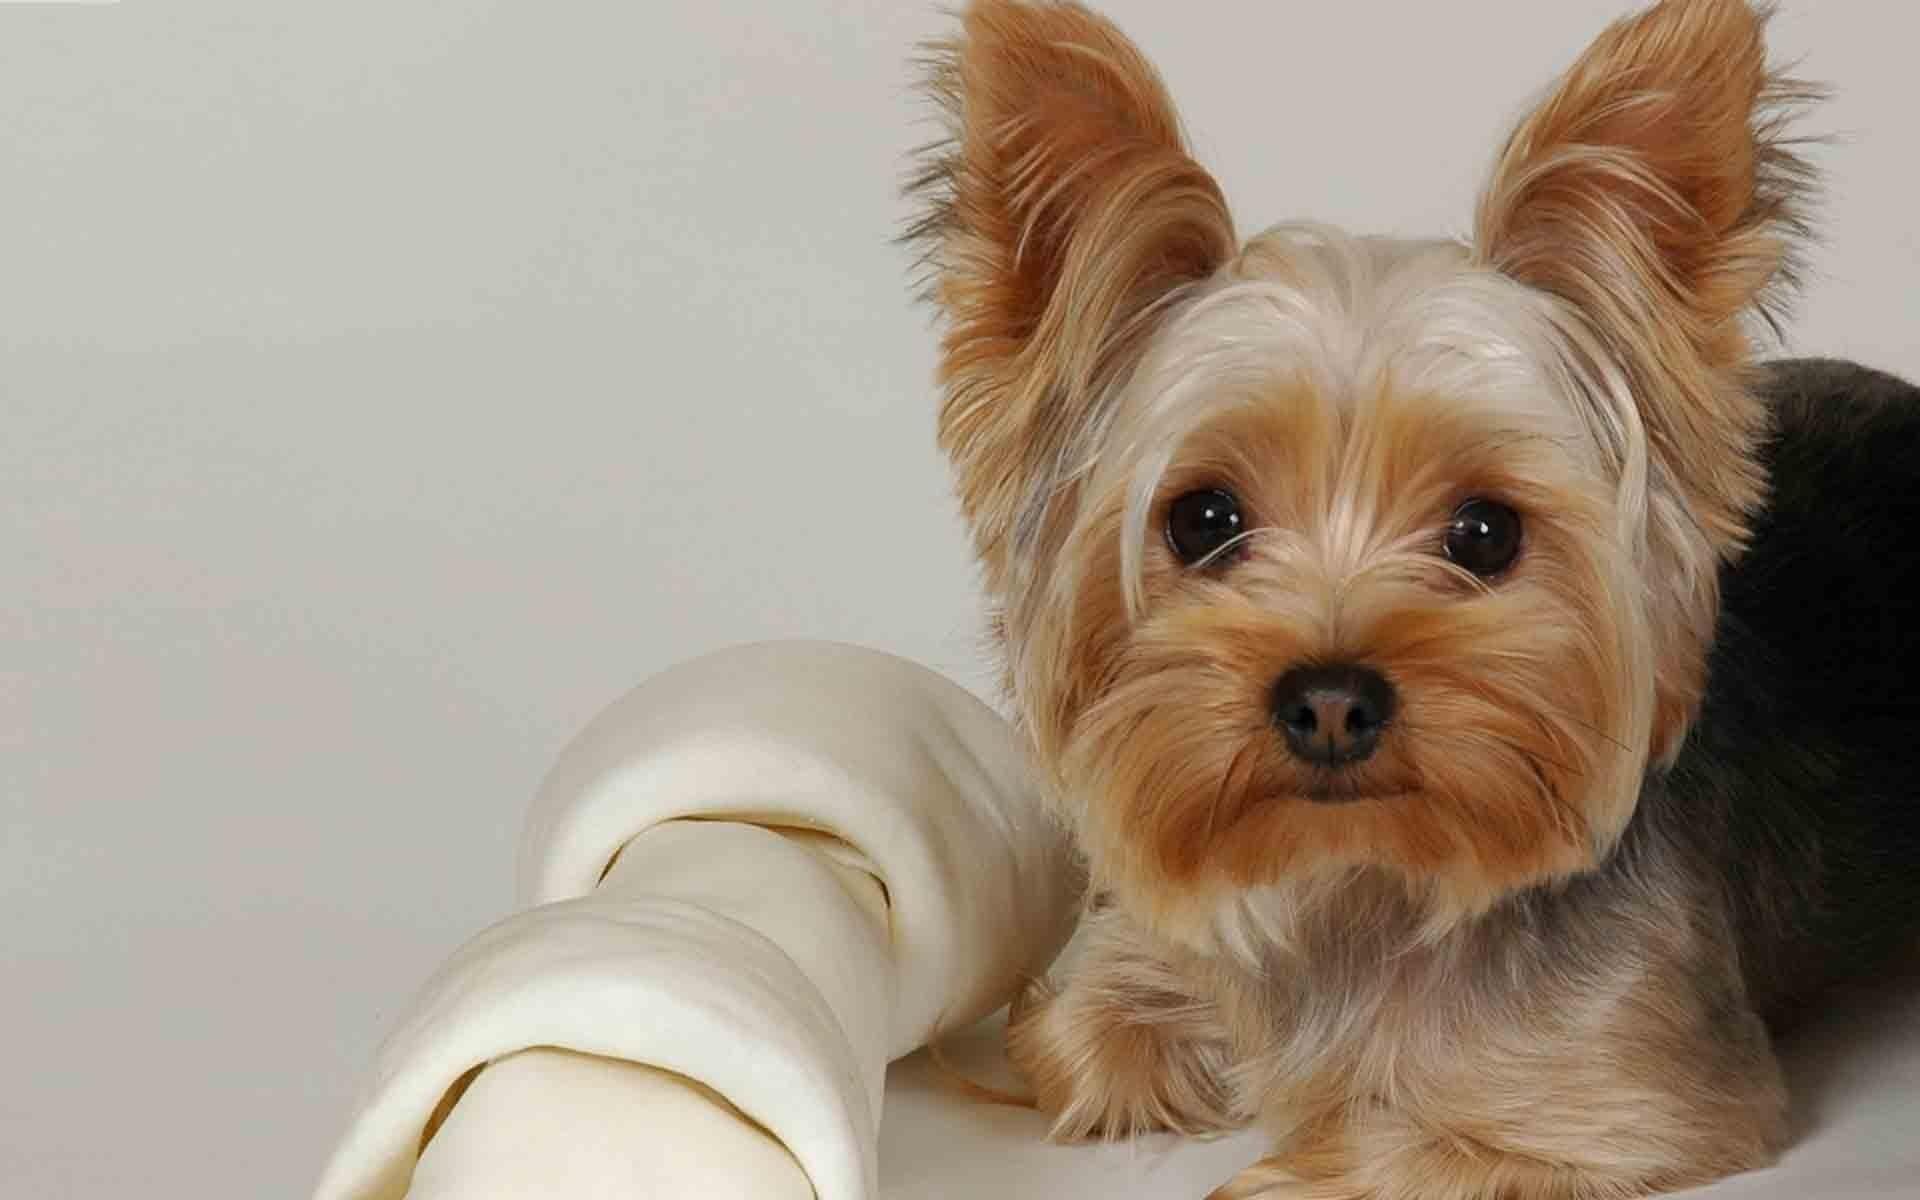 Chihuahua Yorkie Mix HD Wallpaper | Animals Wallpapers | Yorkie | Pinterest  | Animal wallpaper, Chihuahua mix and Animal